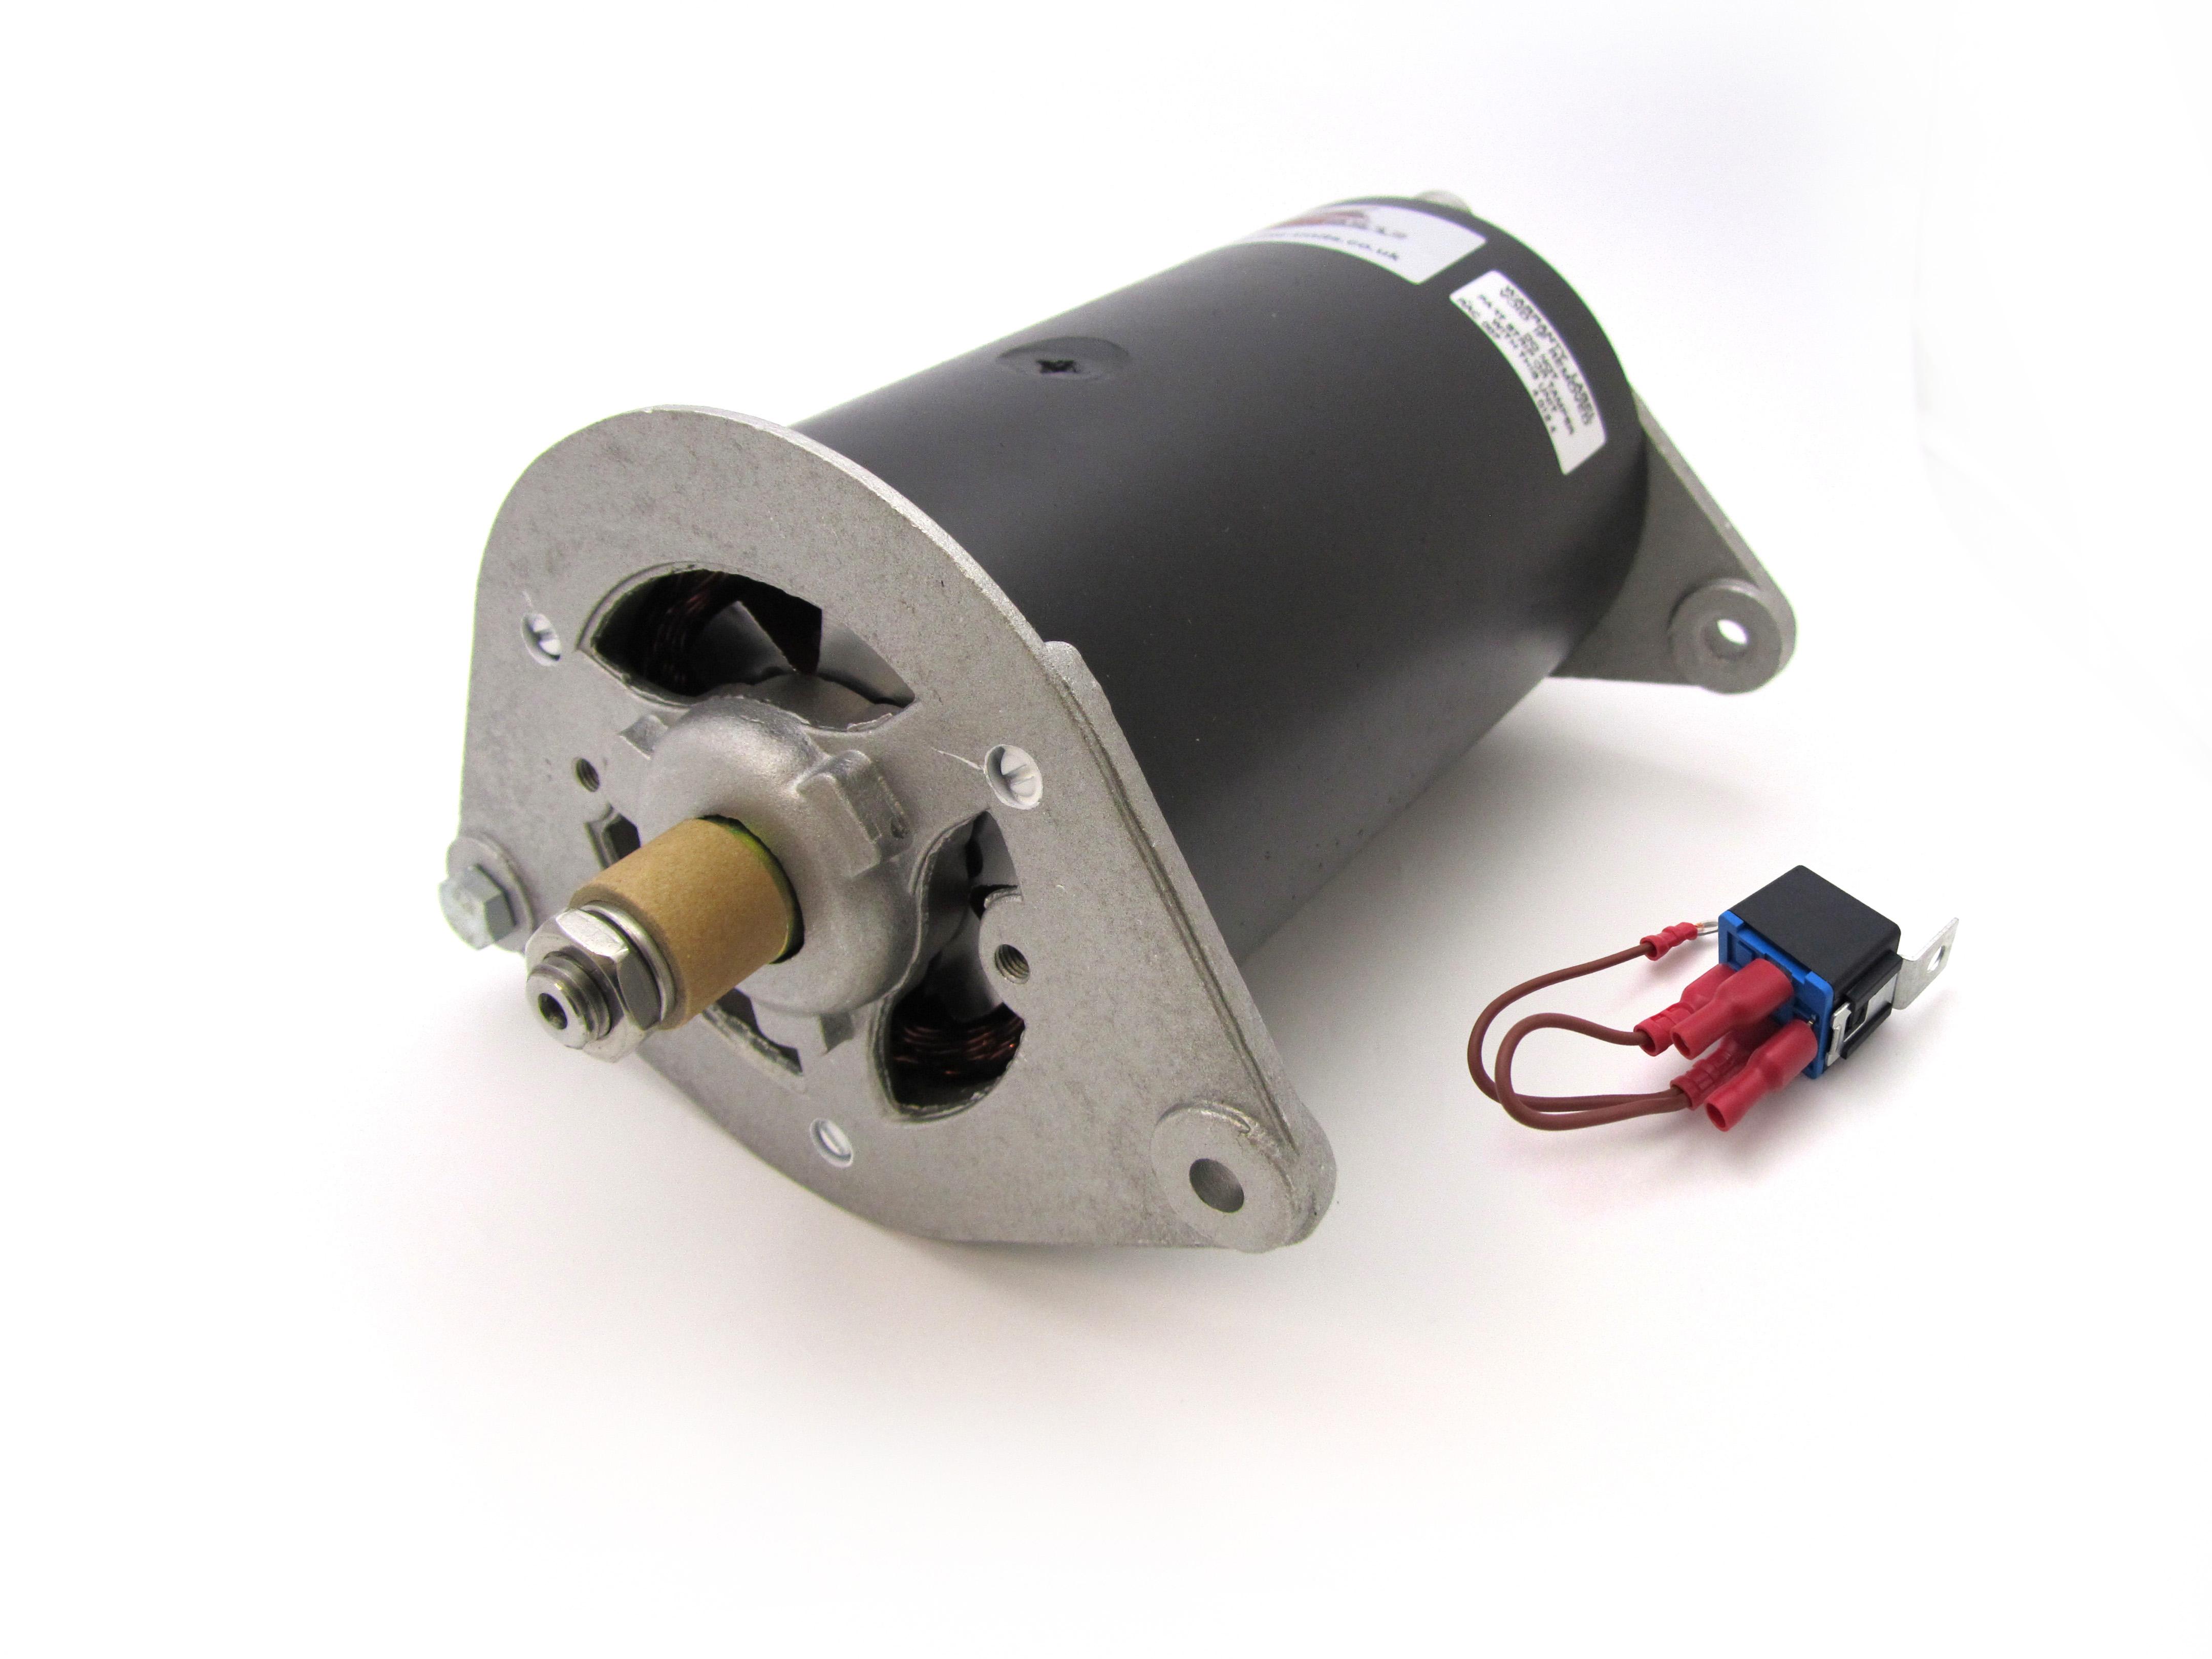 Positif Terre Dynamator Alternateur Dynamo Conversion remplace Lucas C39 C40